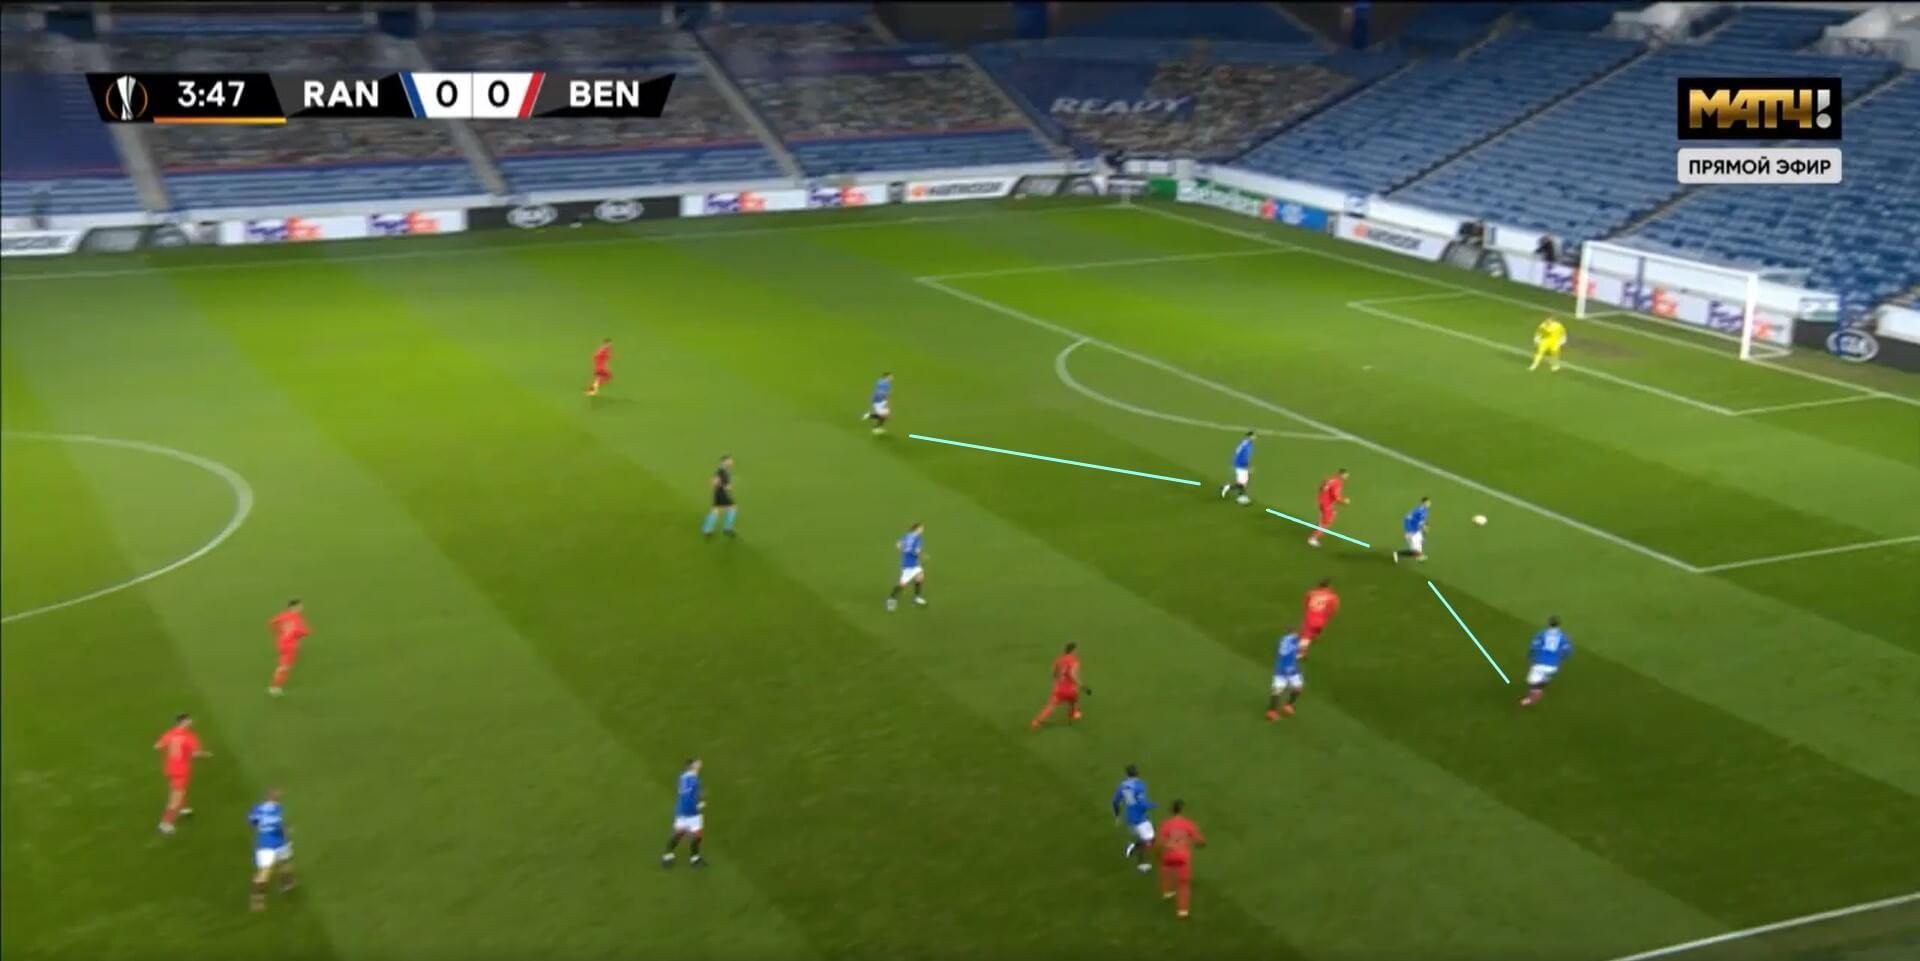 UEFA Europa League 2020/2021: Rangers v Benfica - tactical analysis tactics